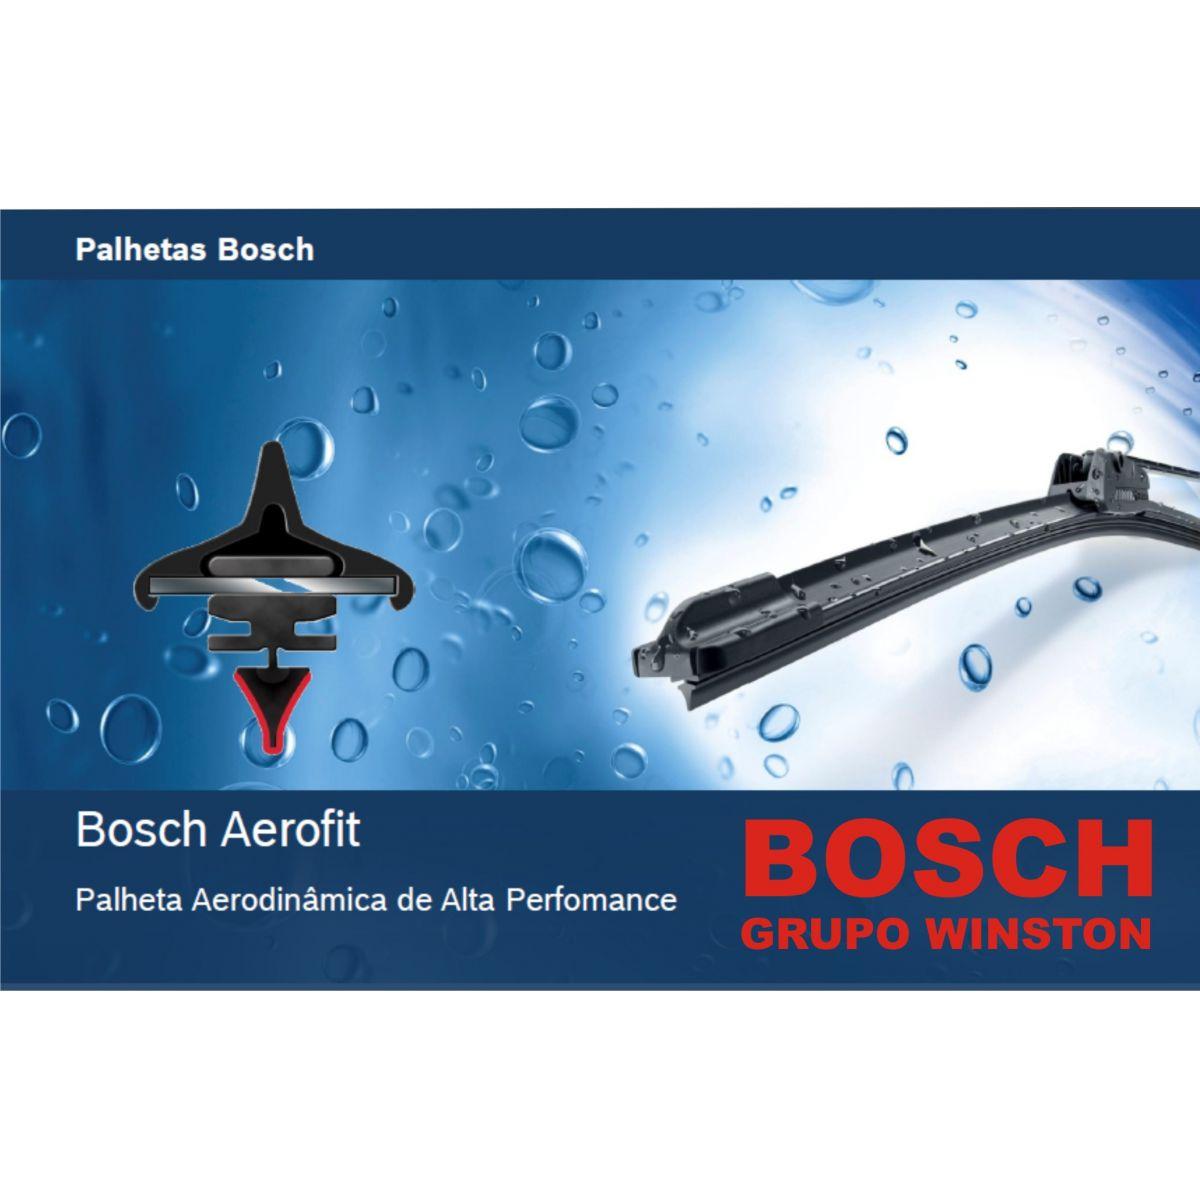 Palheta Bosch Aerofit Limpador de para brisa Bosch PORSCHE 911 Boxster Cayman